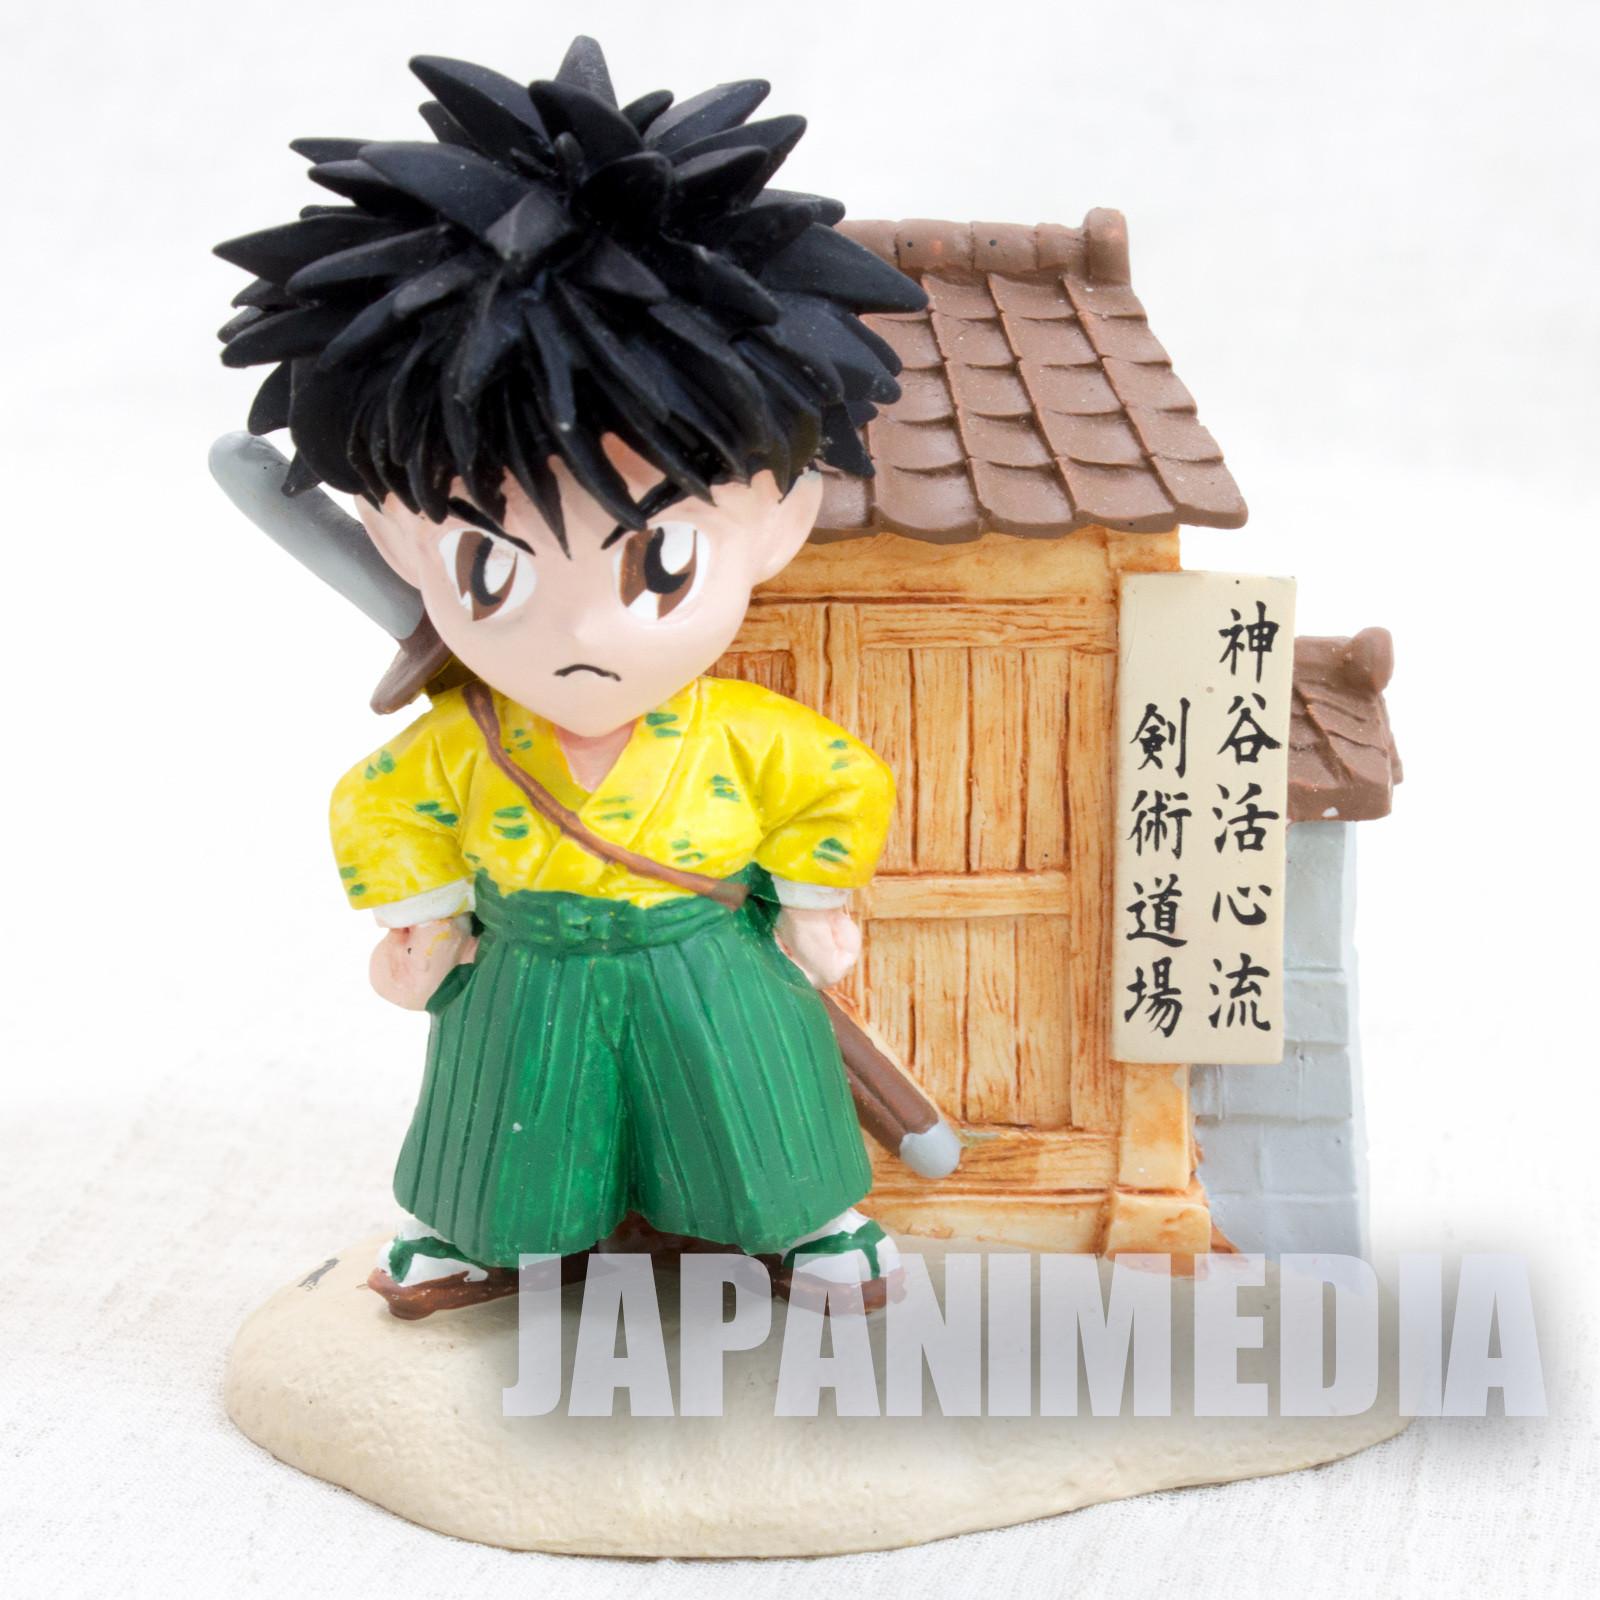 Rurouni Kenshin Yahiko Myoujin Ceramic Figure JAPAN ANIME MANGA